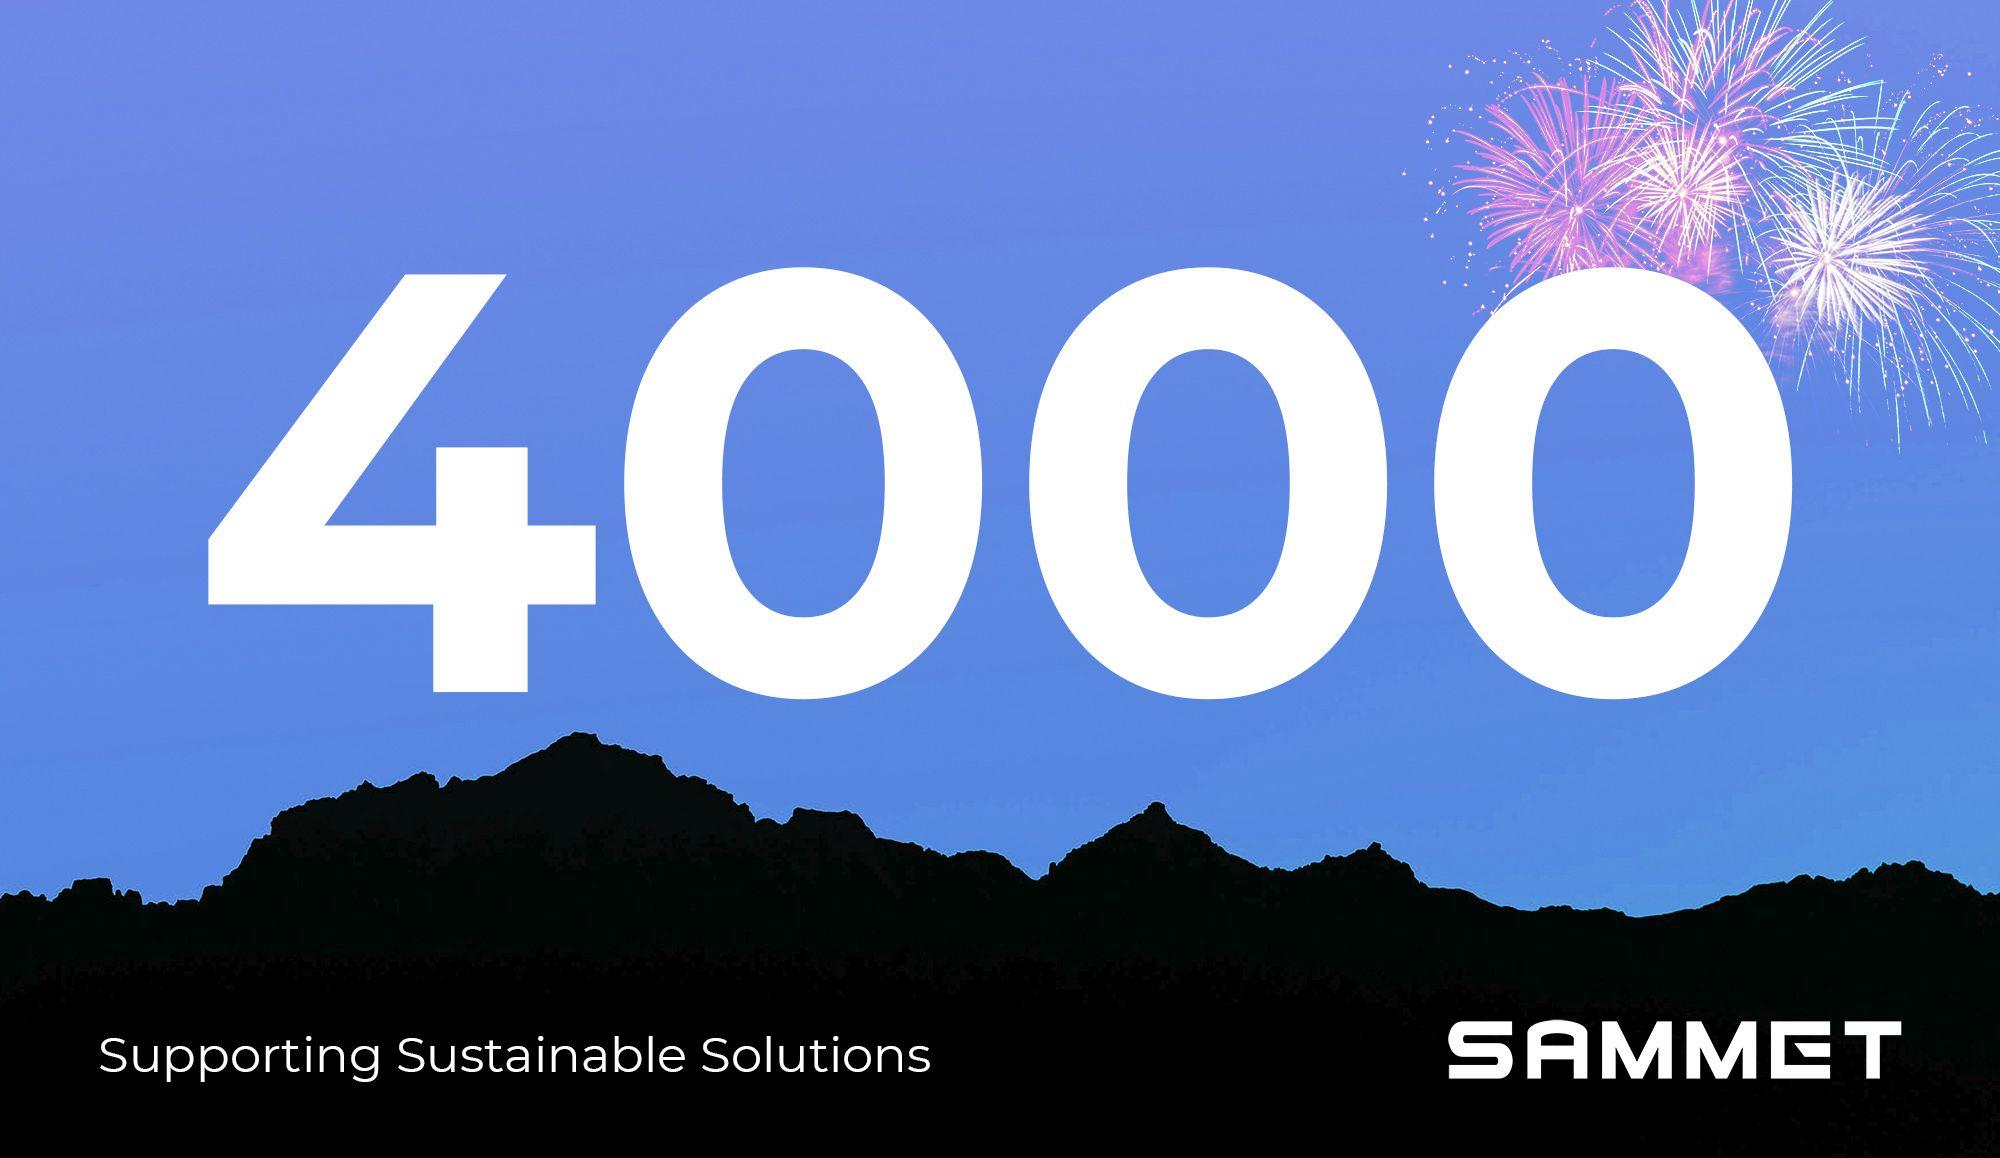 4000 Sammet followers on LinkedIn